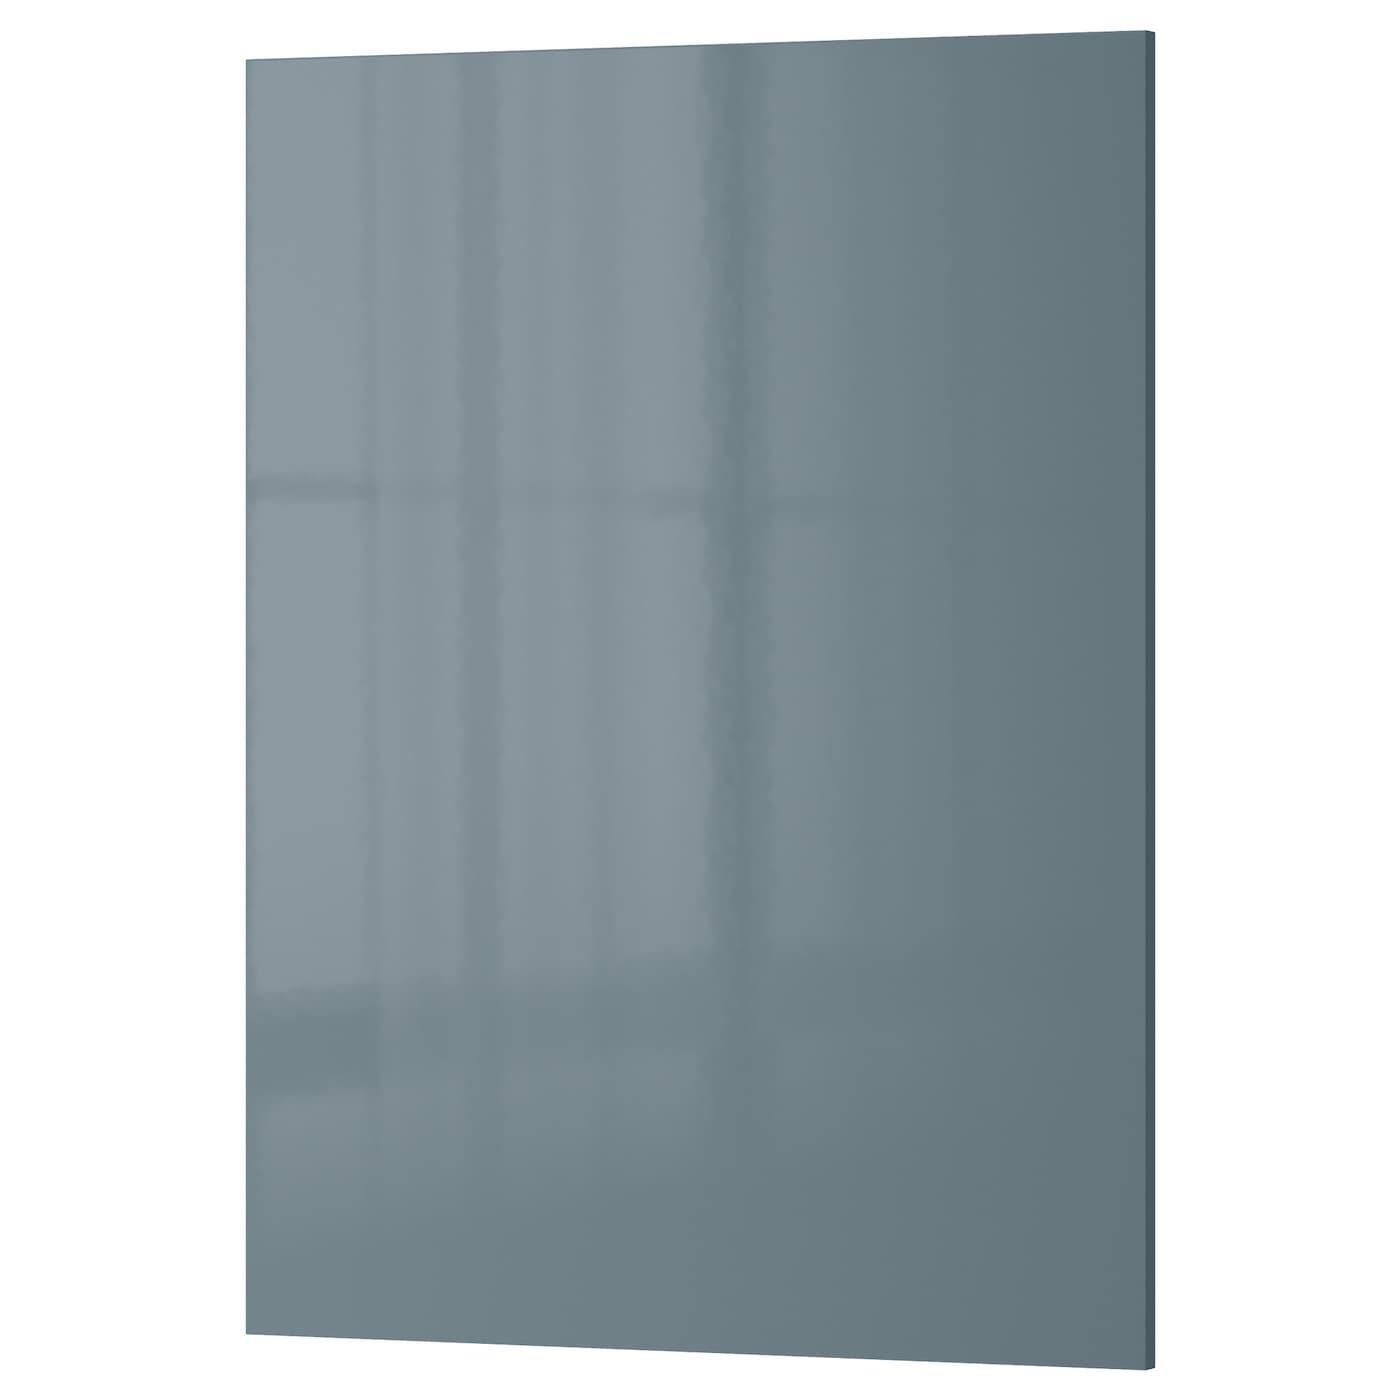 KALLARP Door High-gloss grey-turquoise 60 x 80 cm - IKEA